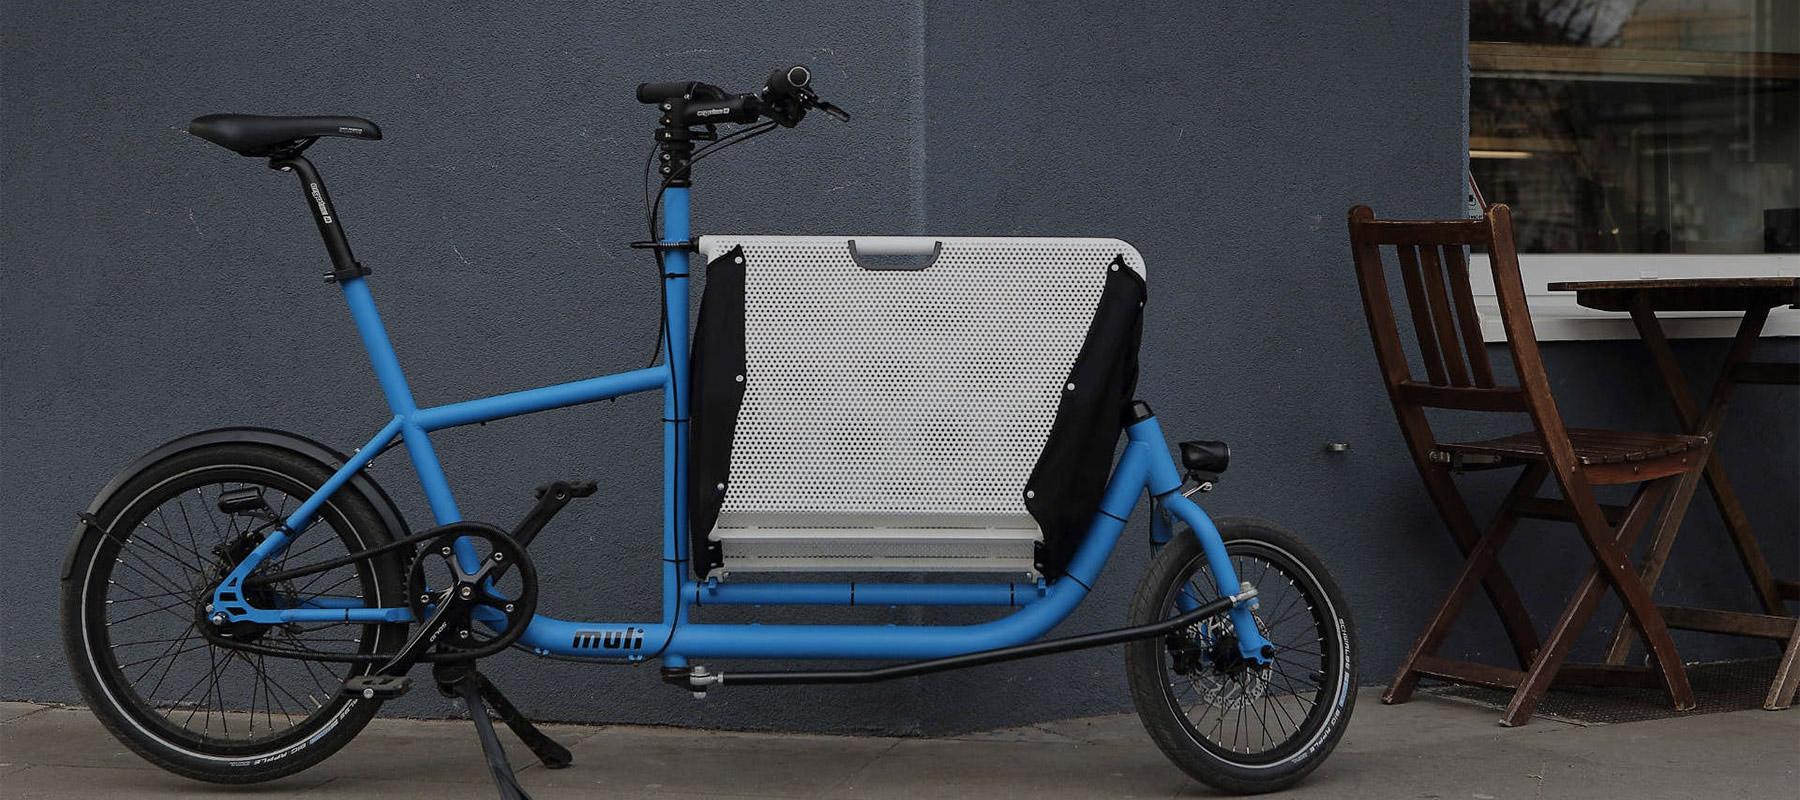 Muli Lastenrad cargo bike